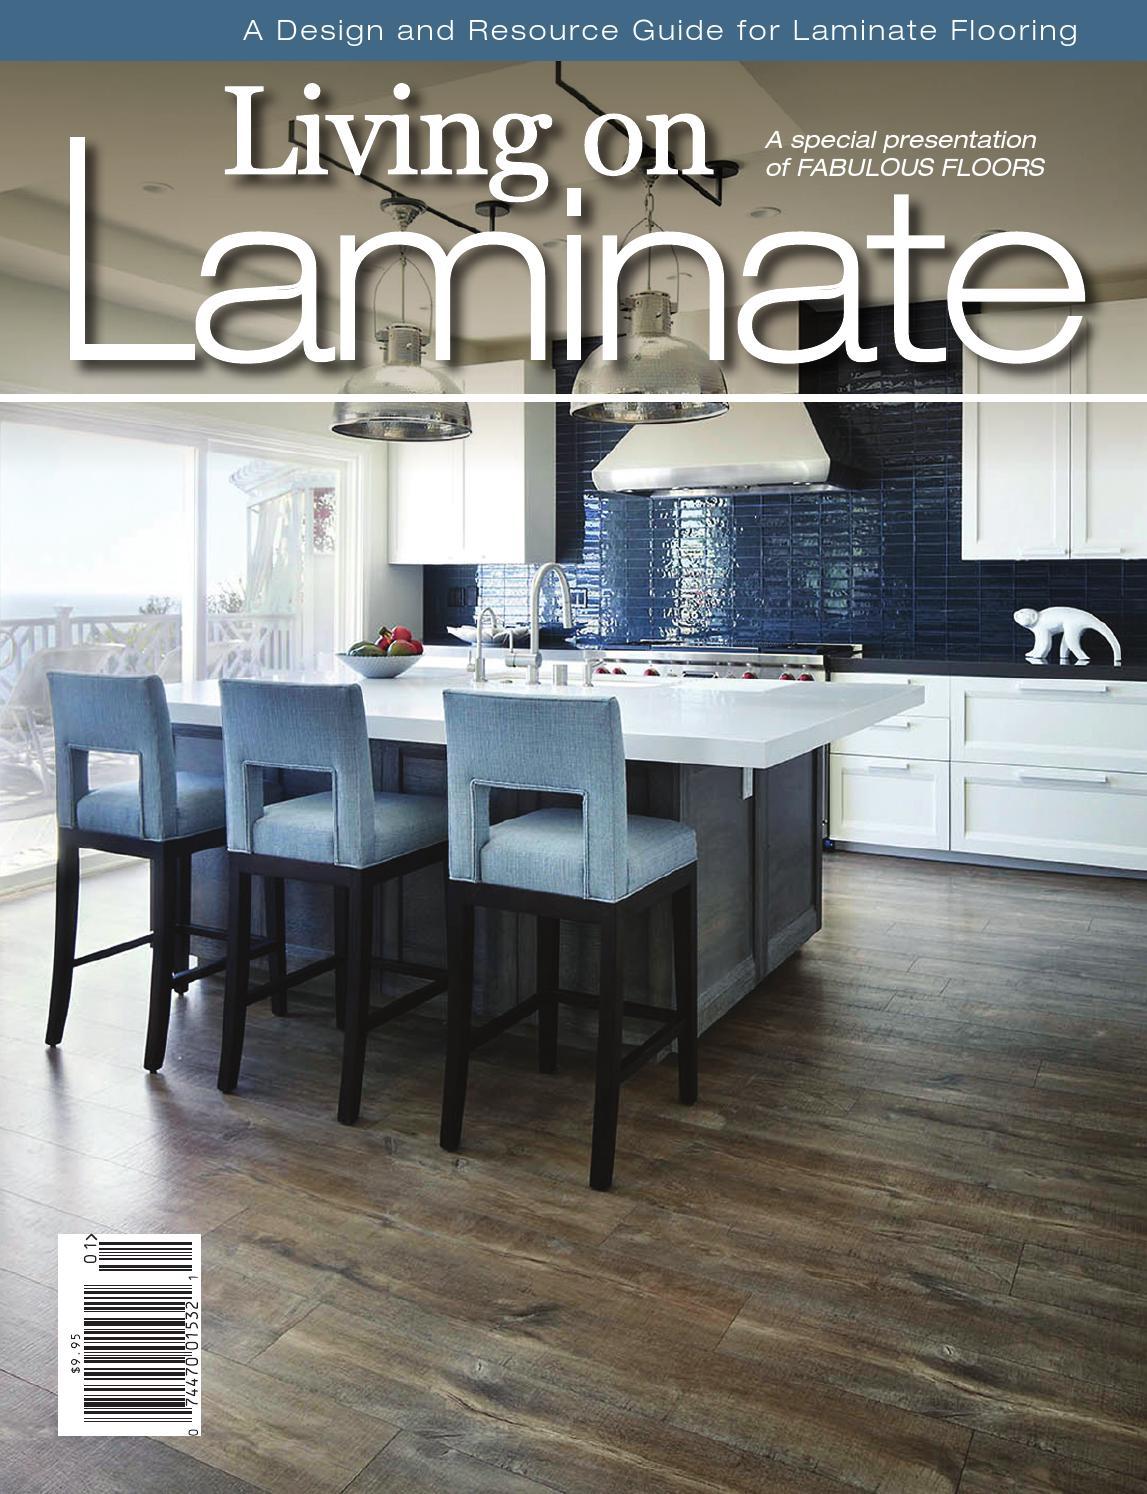 Living on laminate